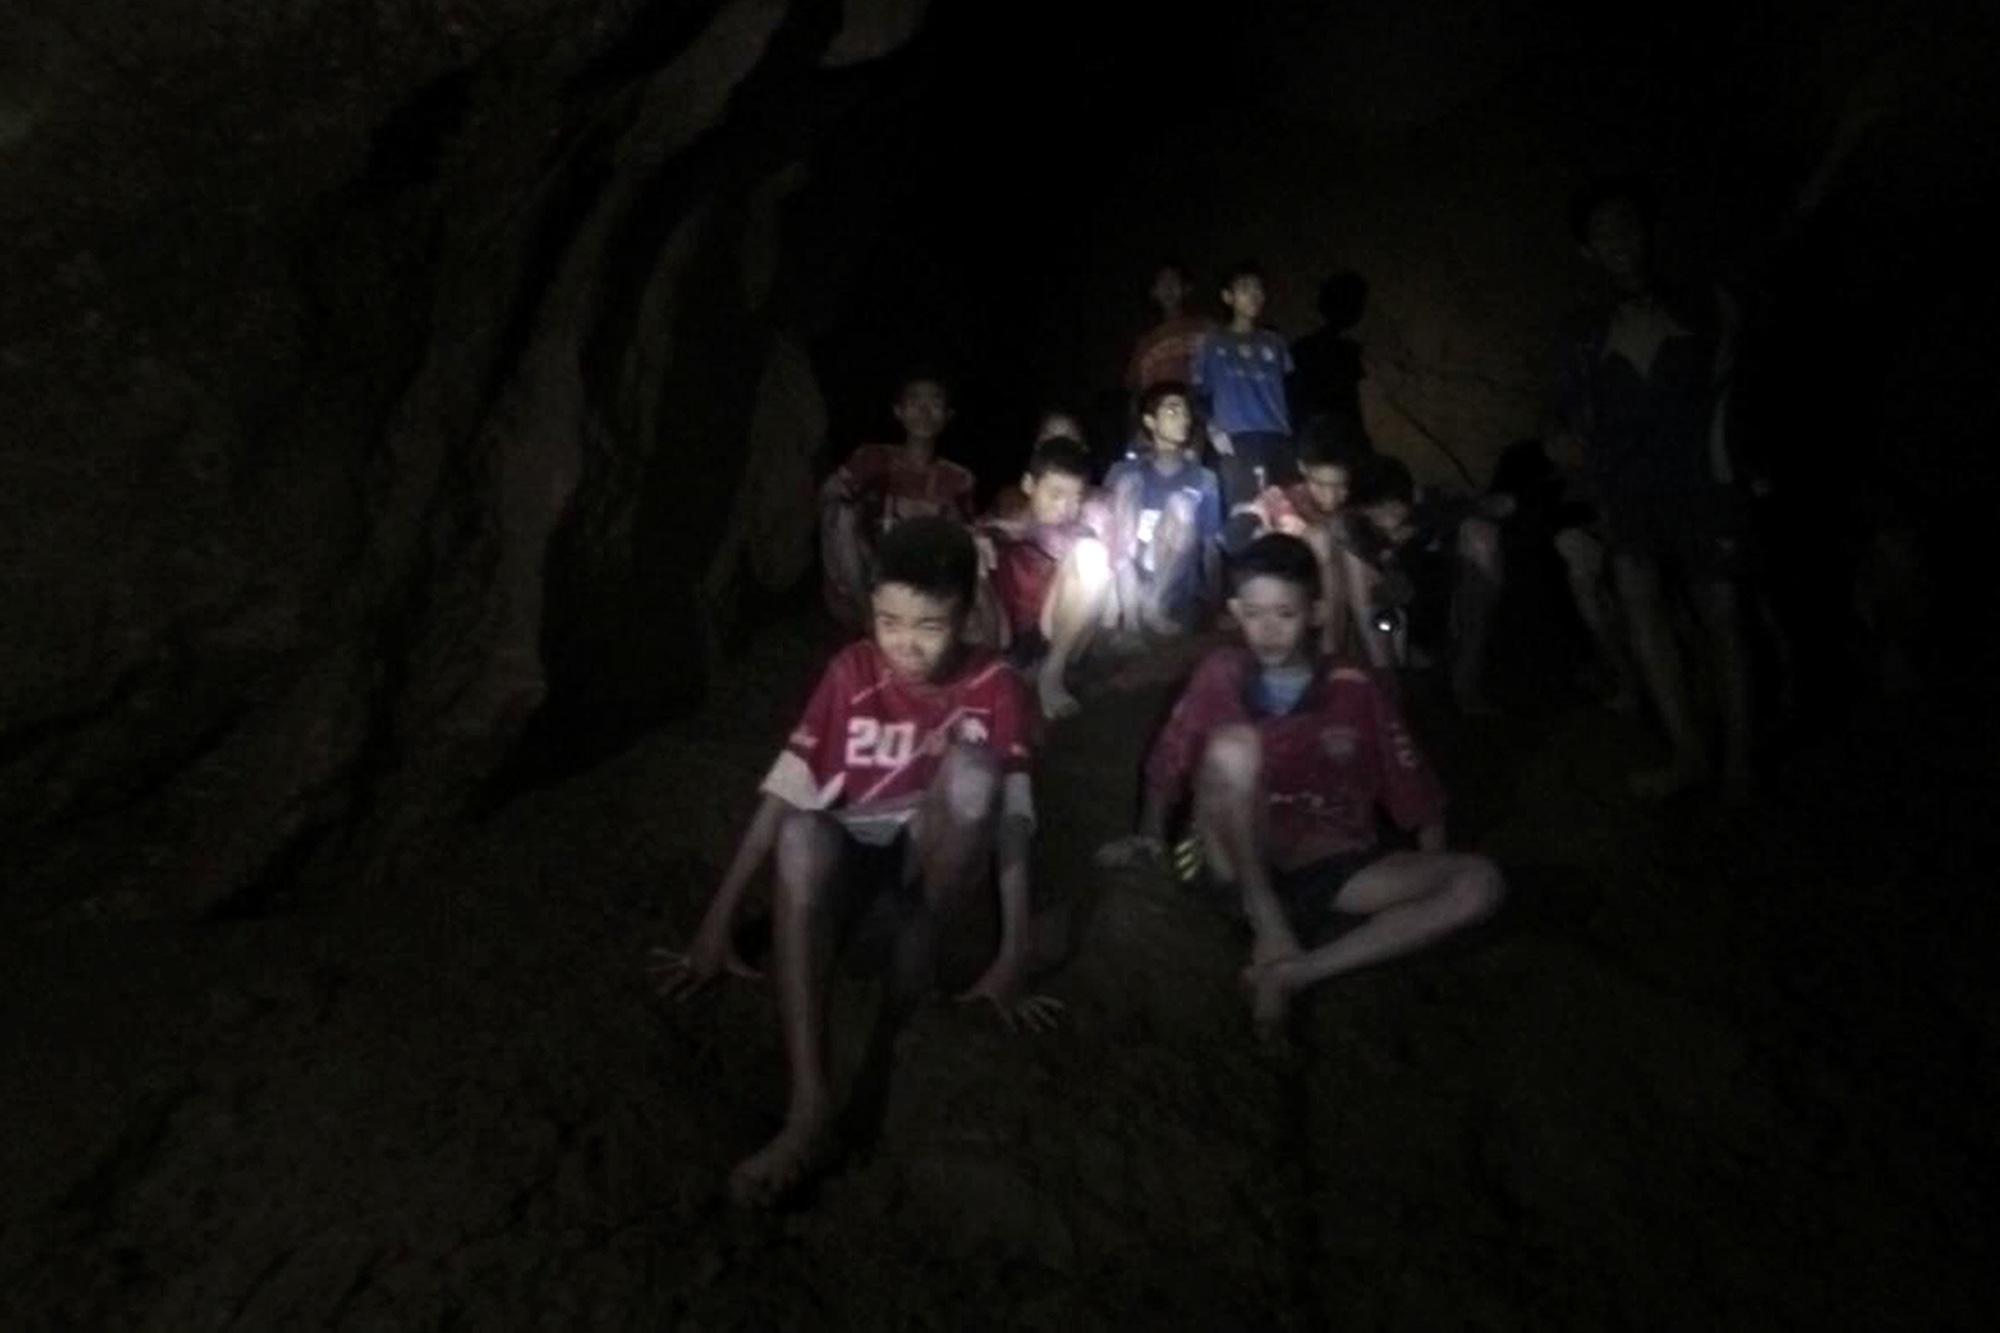 Thai cave missing members of football team found alive, Chiang Rai, Thailand - 02 Jul 2018